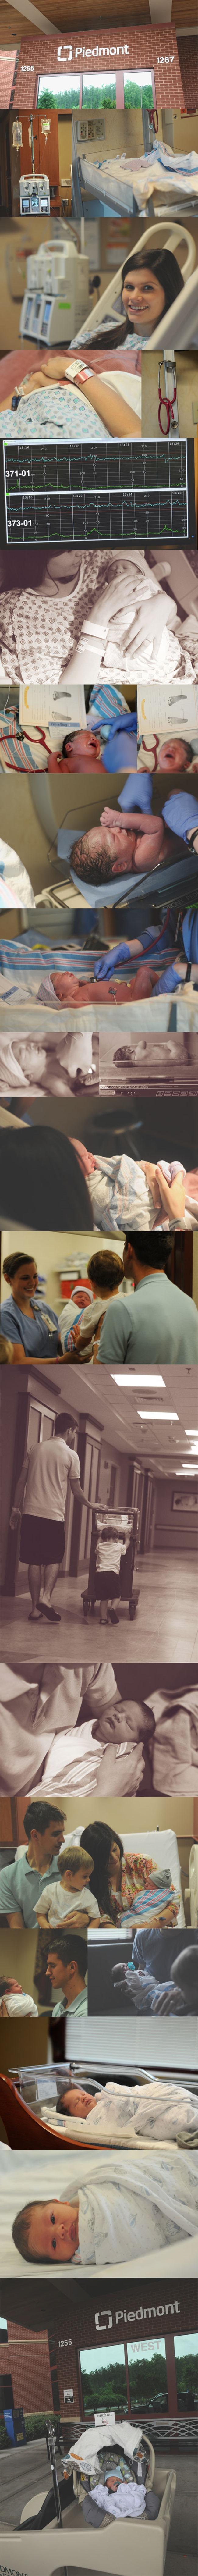 photos hospital birth piedmont fayette newborn black and white ideas photos photo good morning loretta goodmorningloretta